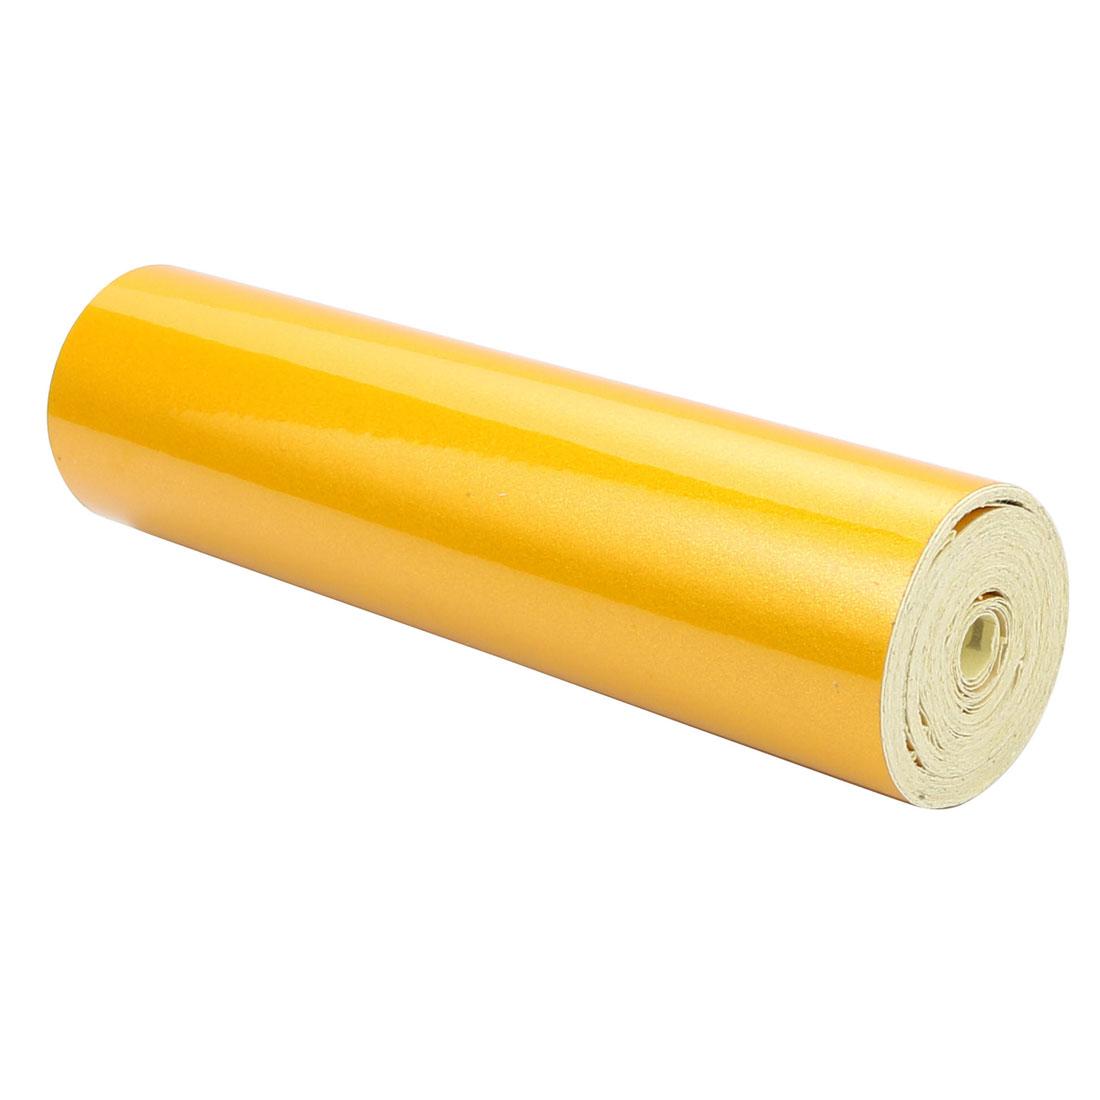 15cm Width 5M Length Single Sided Adhesive Reflective Warning Tape Yellow